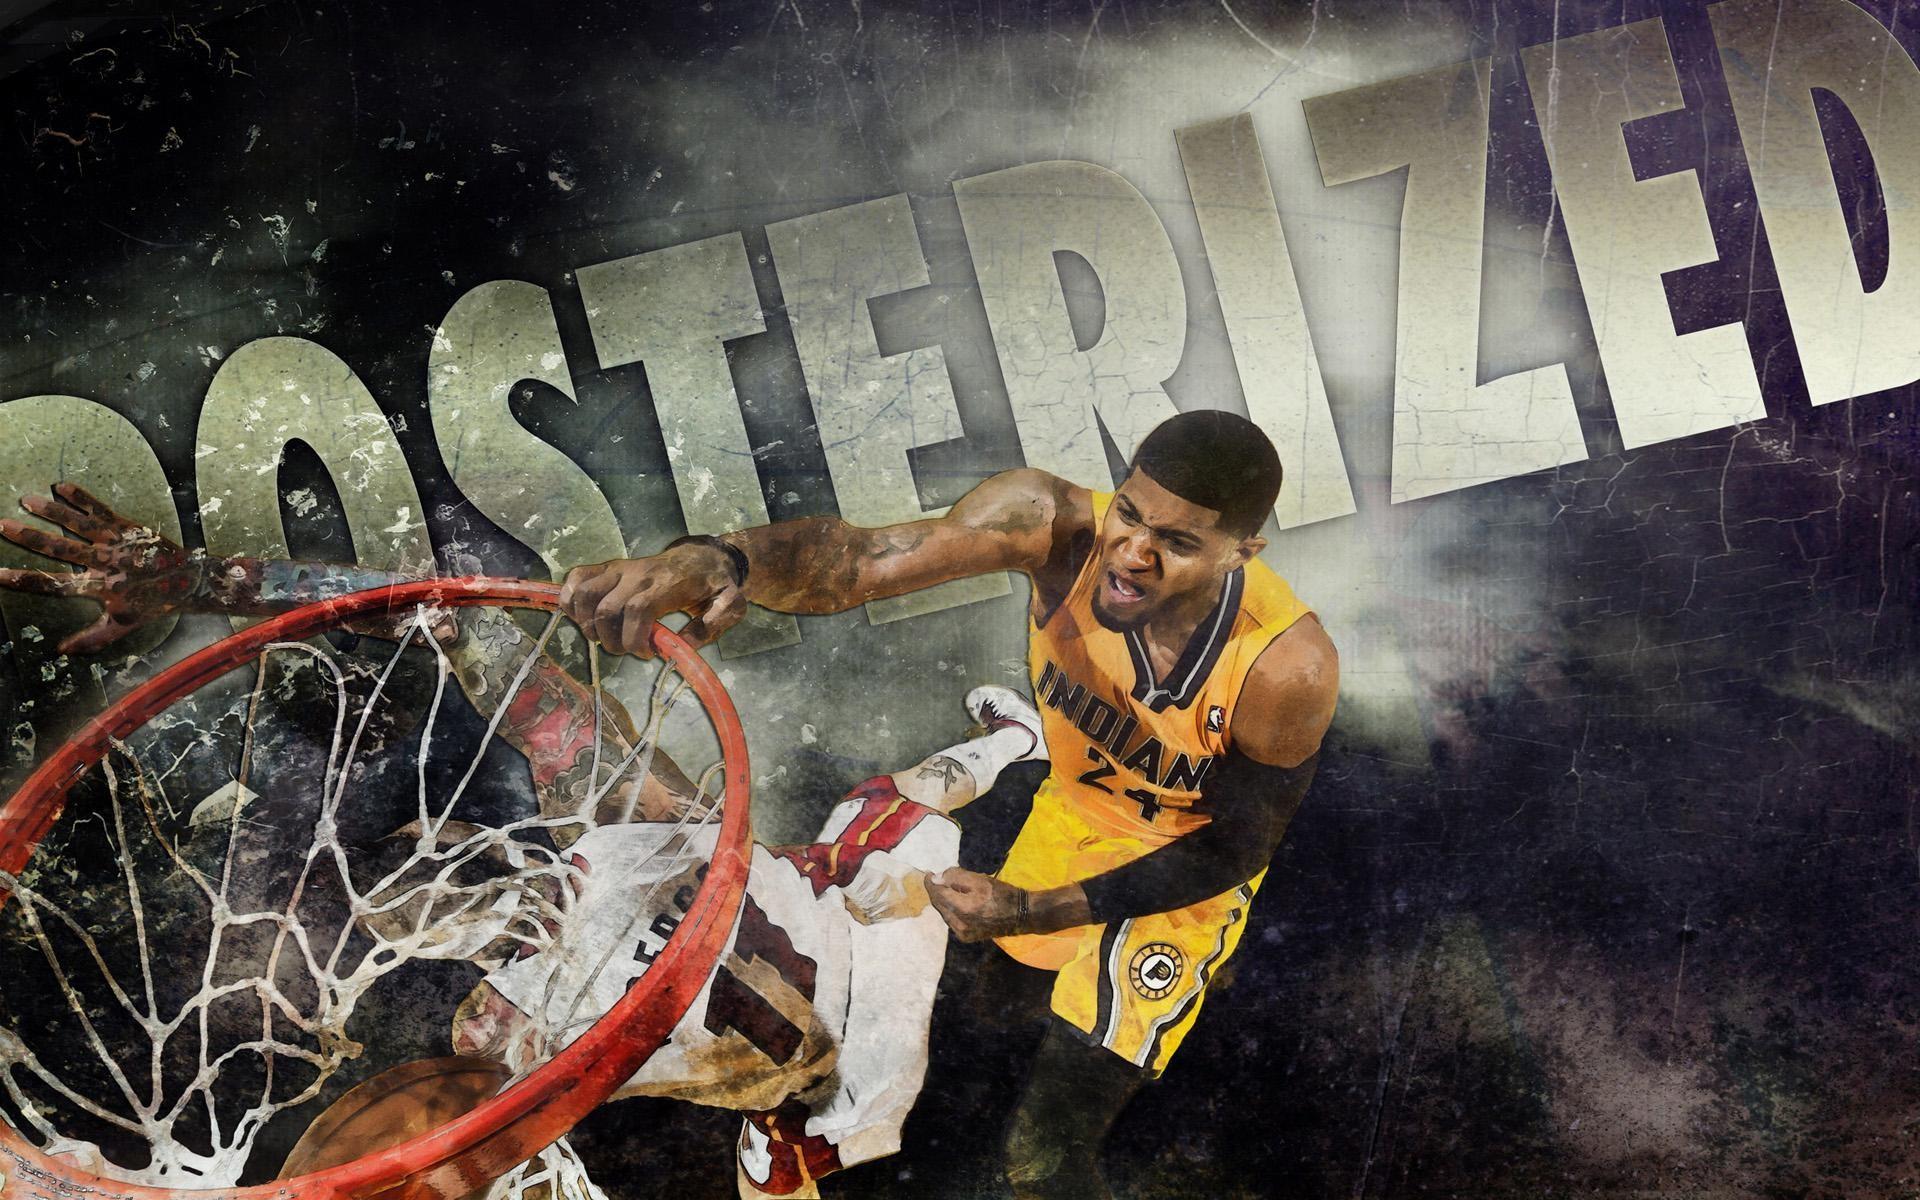 Paul-George-Indiana-Pacers-NBA-Wallpaper-HD